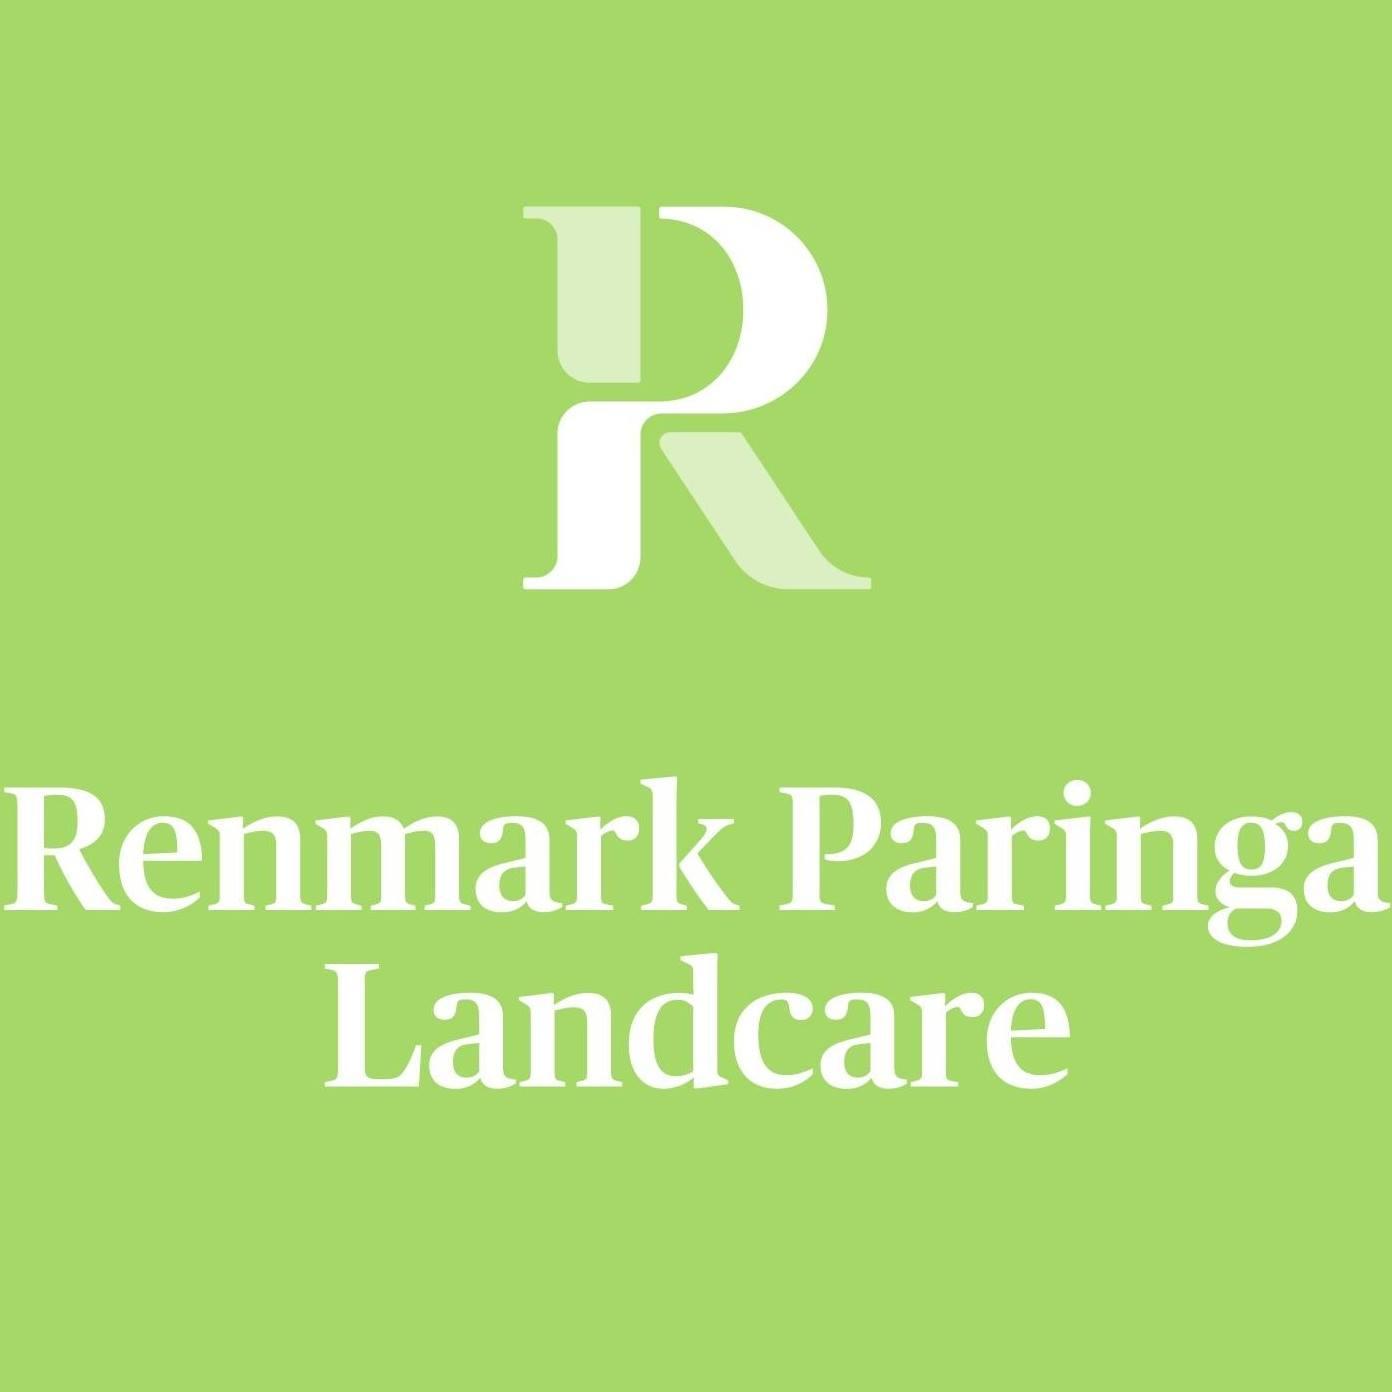 Renmark Paringa Landcare